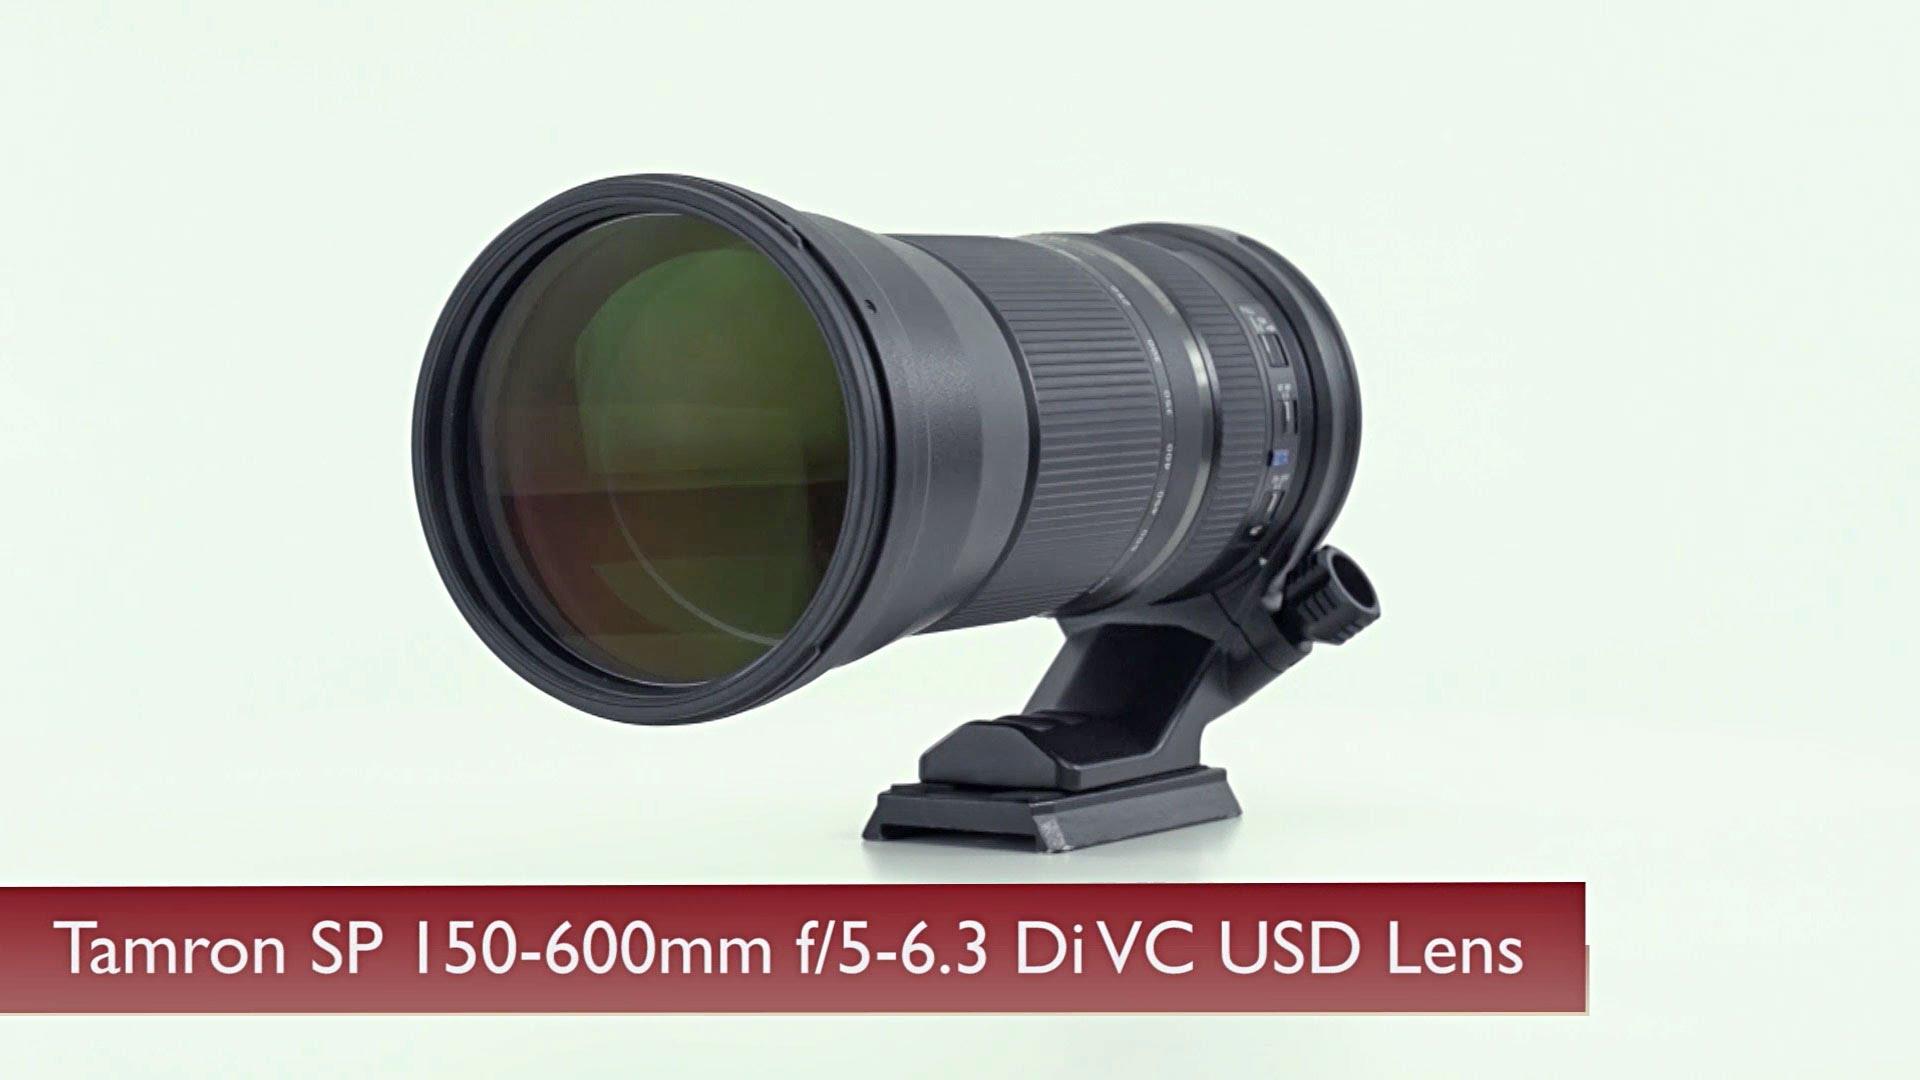 Tamron SP 150-600mm f/5-6.3 Di VC USD Zoom